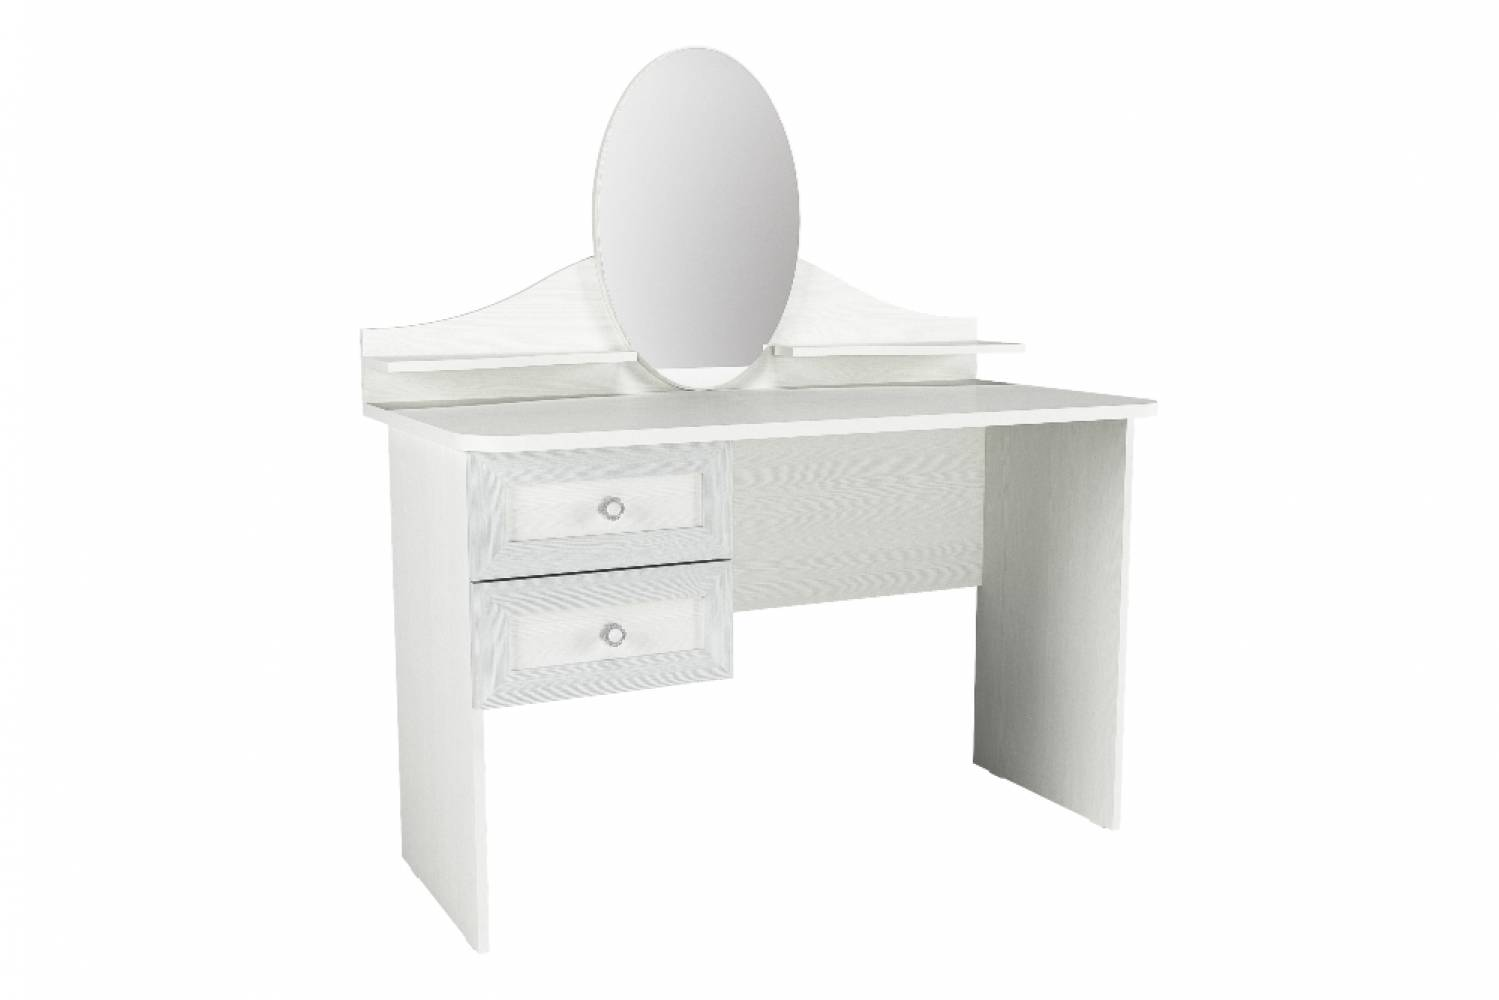 Стол туалетный НМ 011.09-01 М1 ПРОВАНС